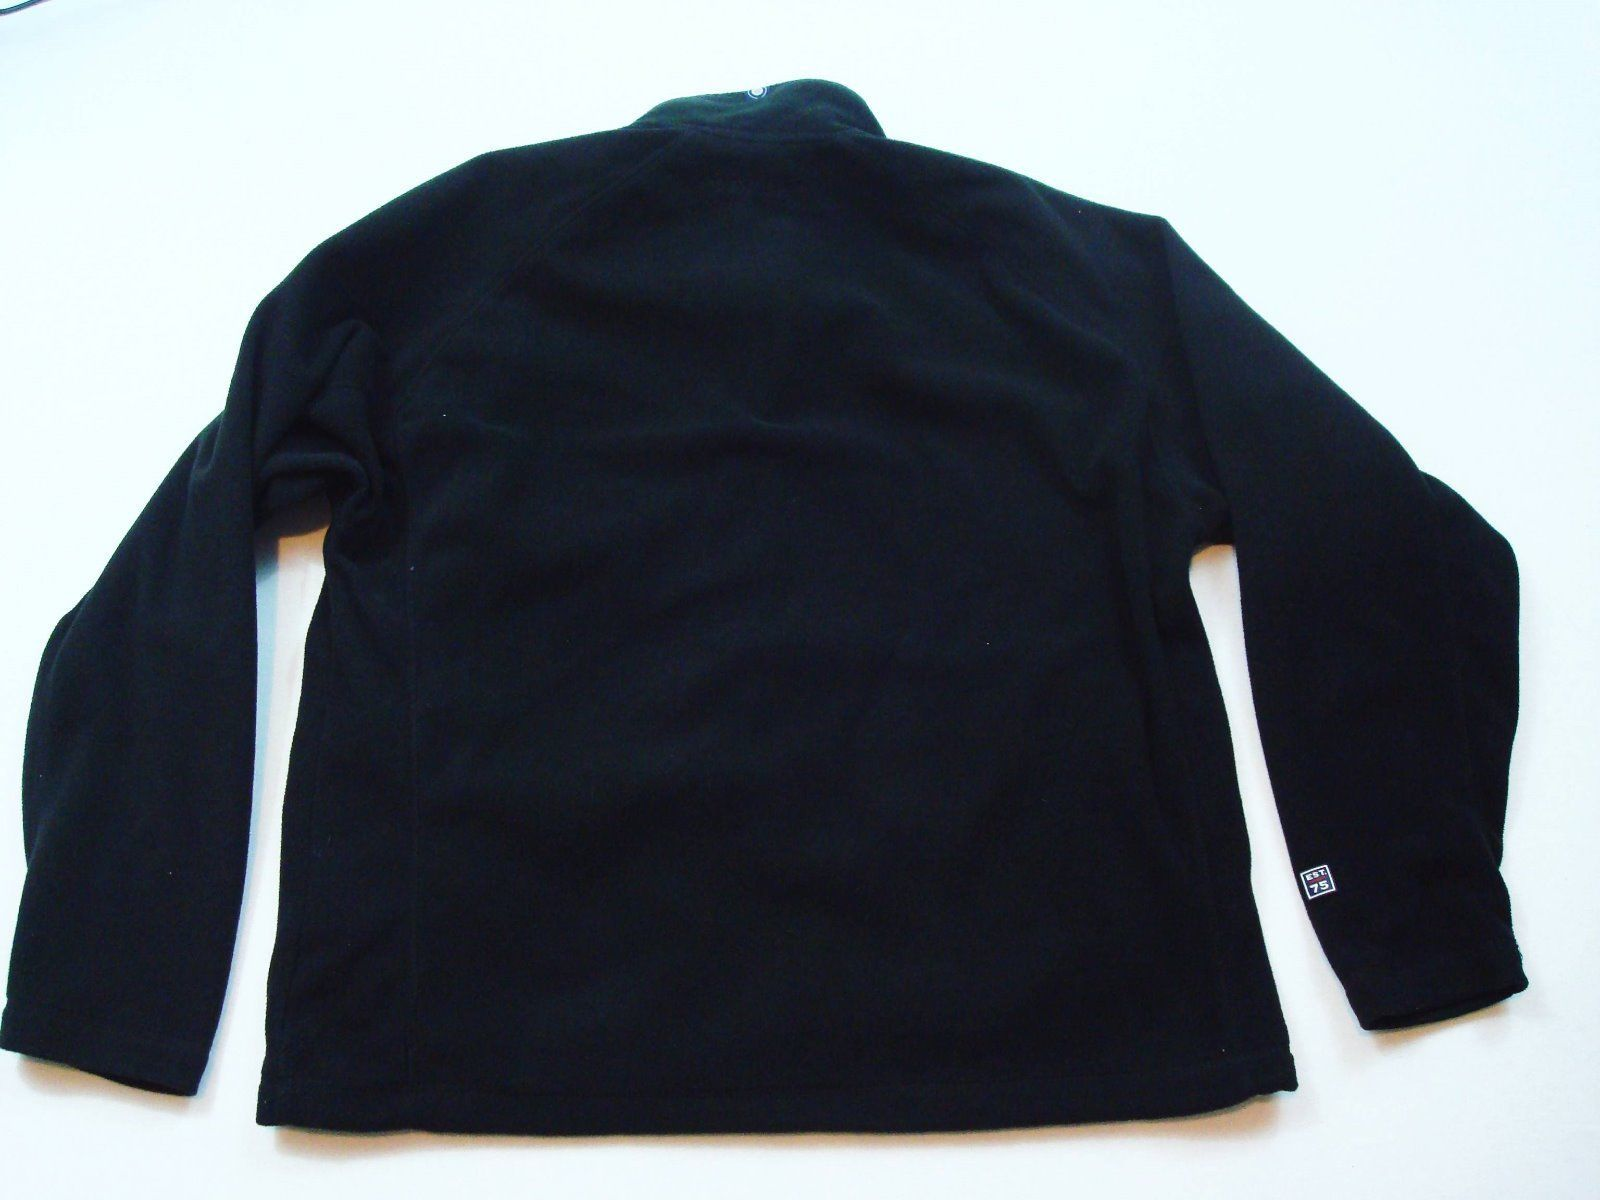 Mcafee Virus Reißverschluss Fleece Jacket Landmark Schwarz Größe L Herren T71 image 6